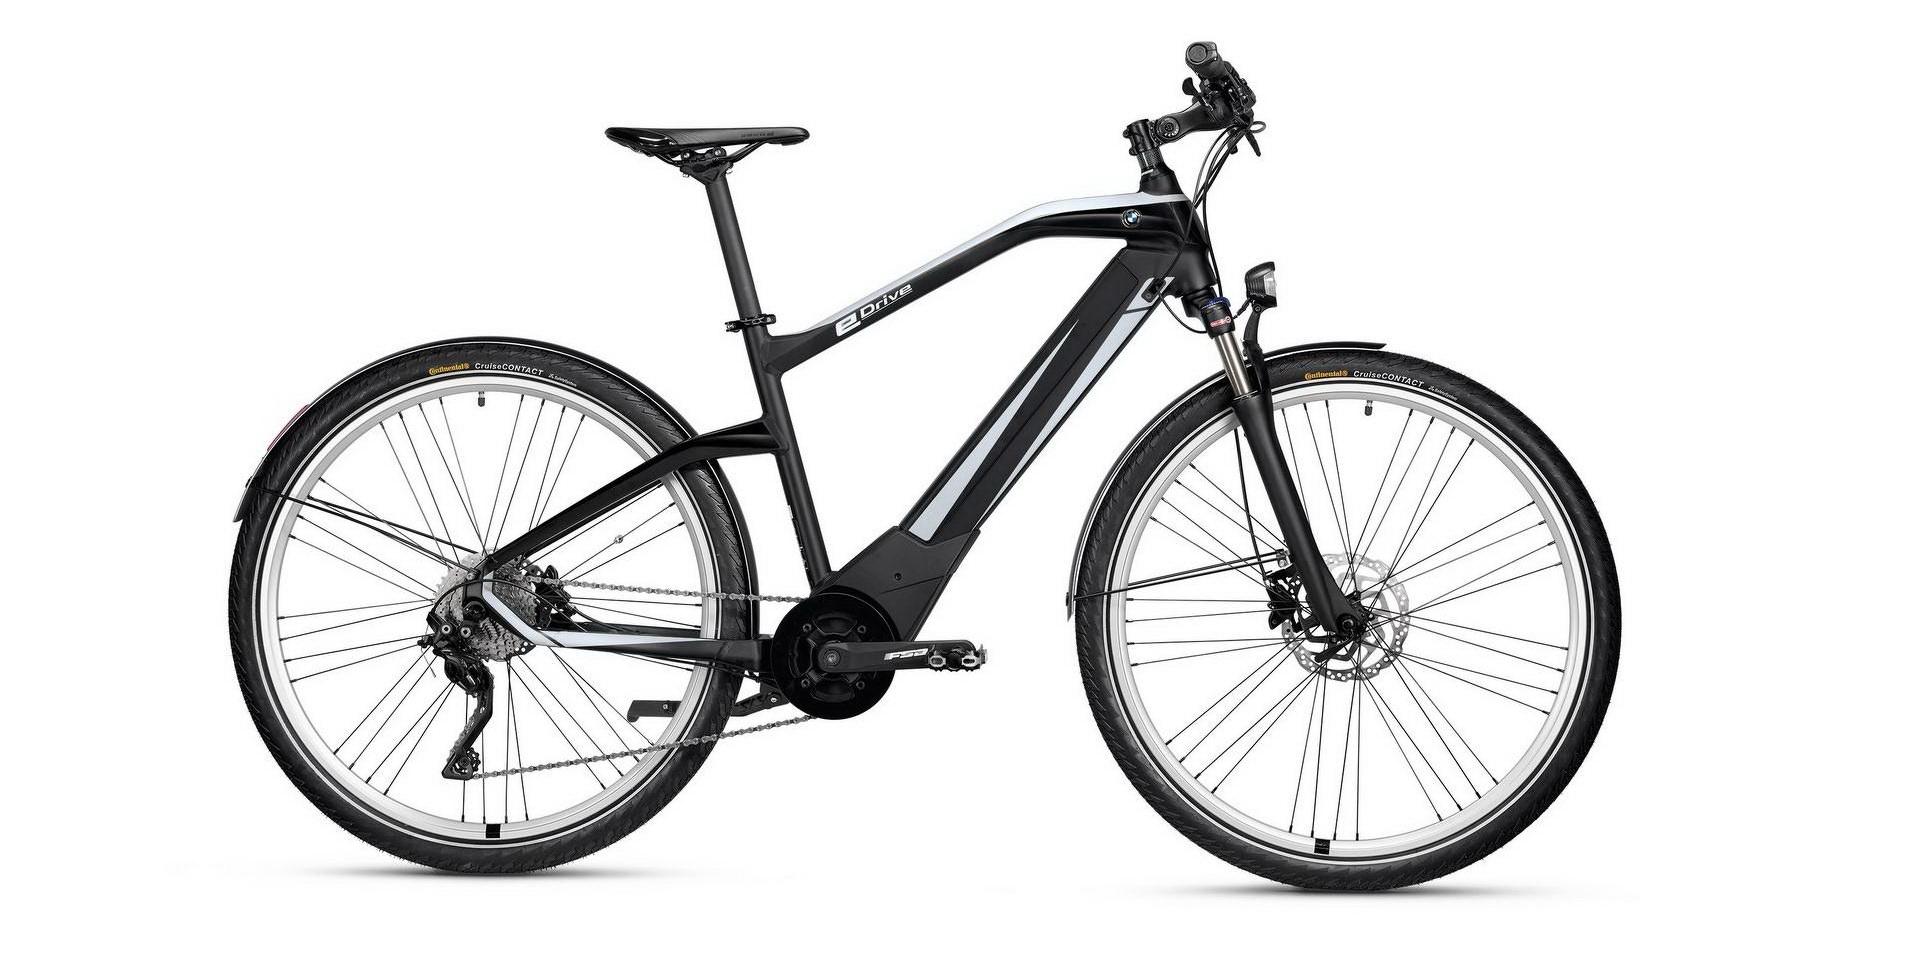 BMW踏入電動自行車市場,輸出竟然跟Renault Twingo一樣大!